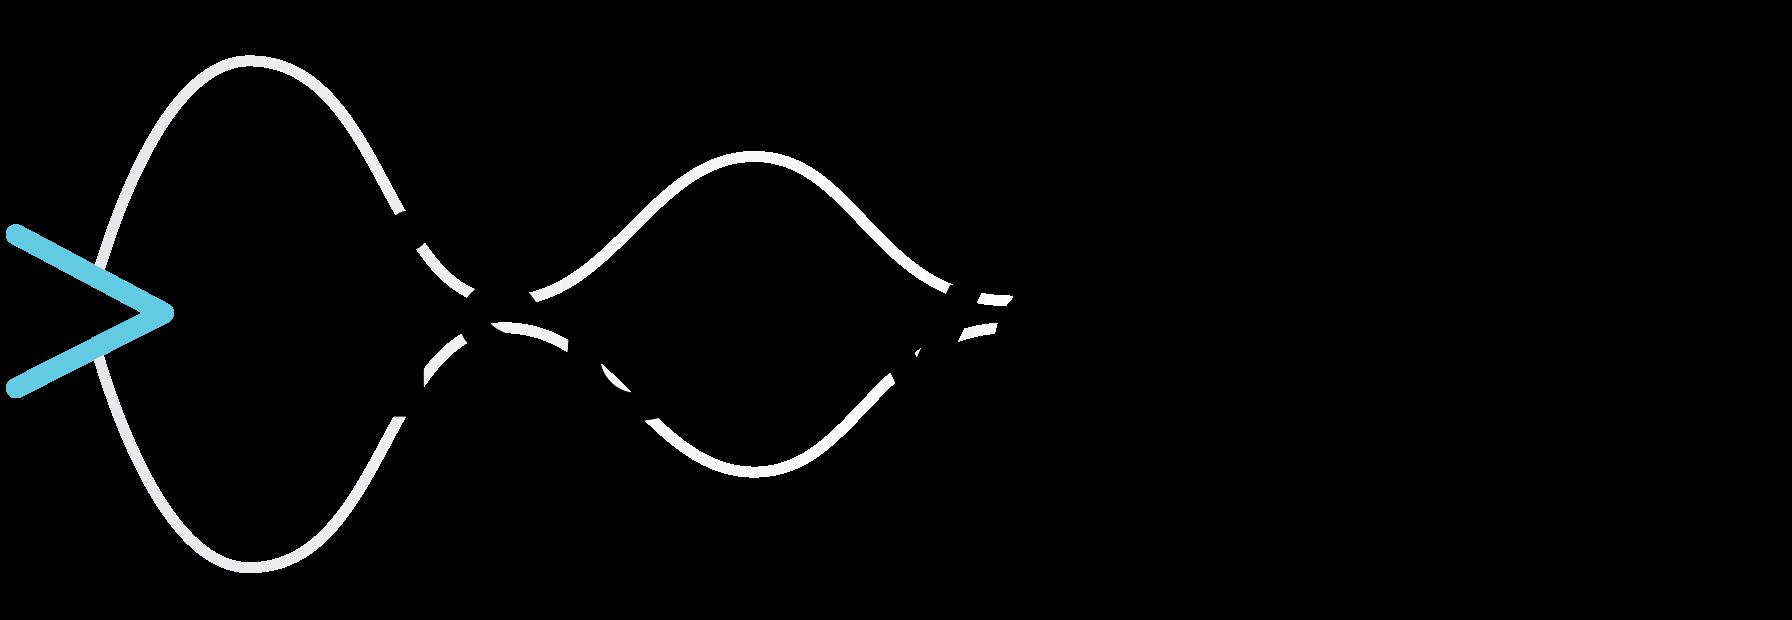 DiscoverHeader-2